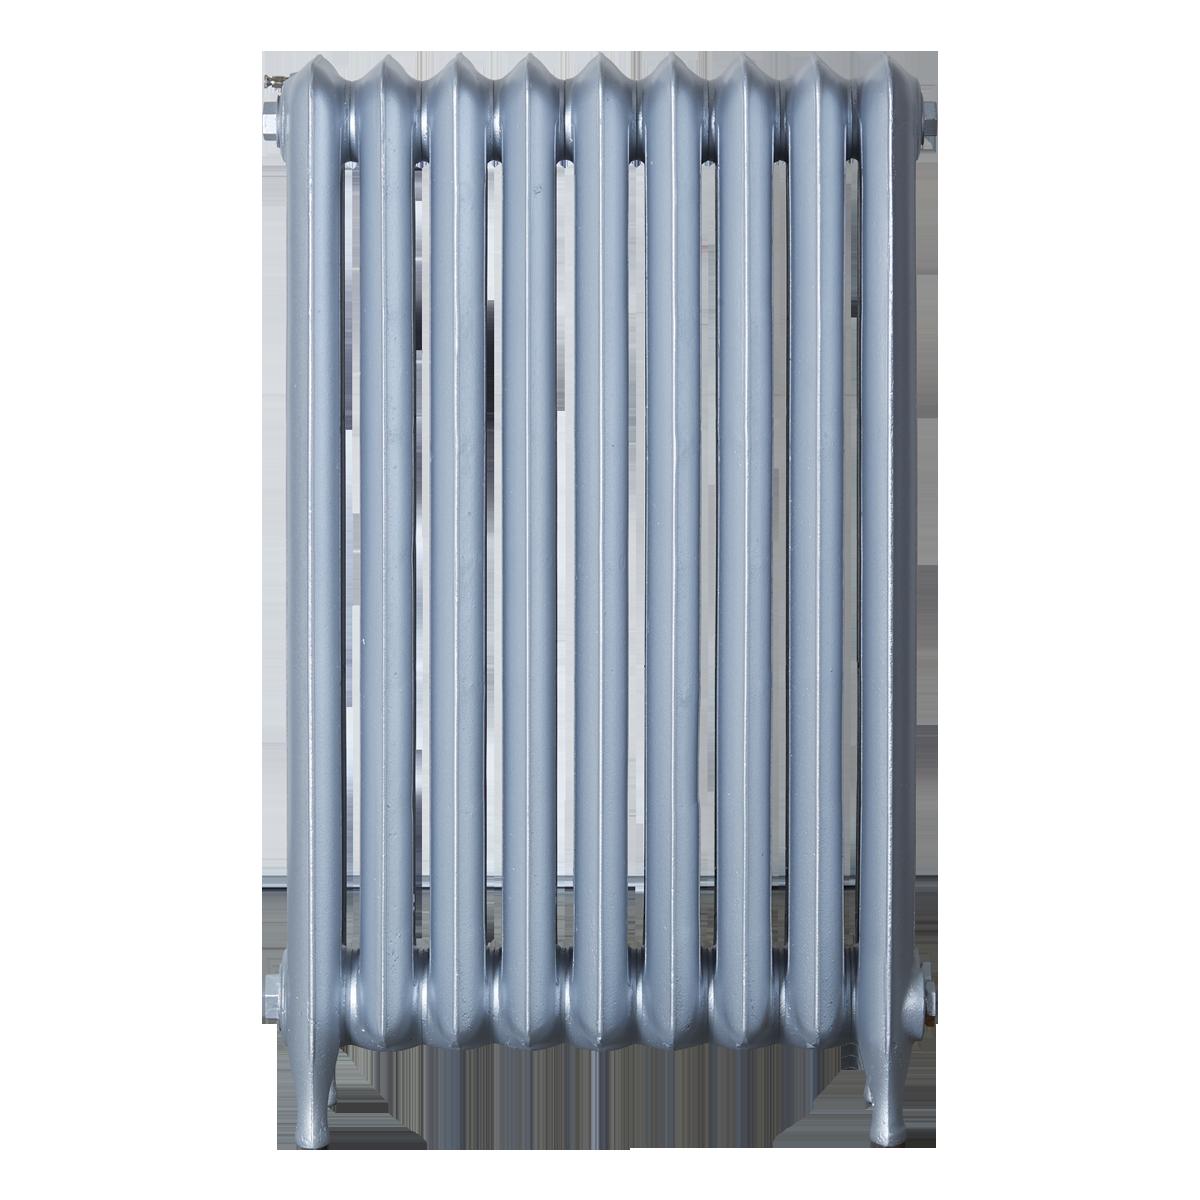 Ironworks Radiators Inc. refurbished cast iron radiator Dragonfly in Platinum Metallic